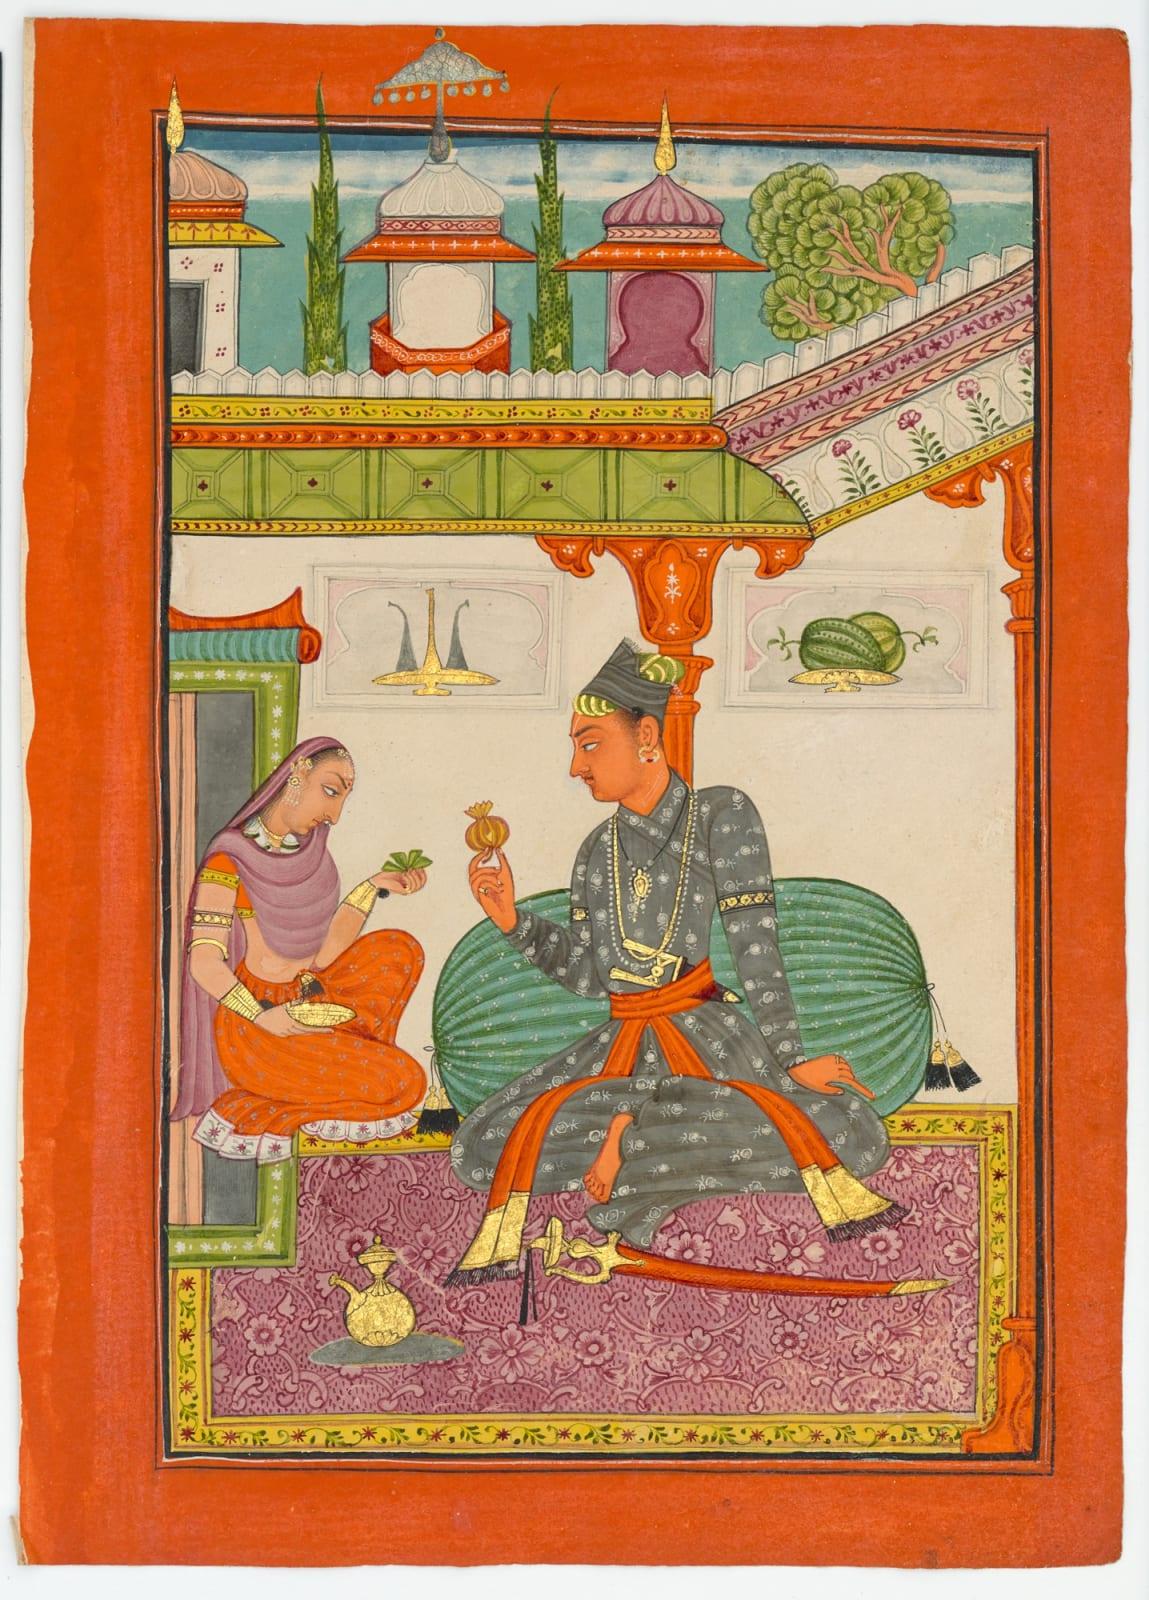 Madhu raga, son of Bhairav raga; Page from a Ragamala series, Bilaspur, 1690–1700